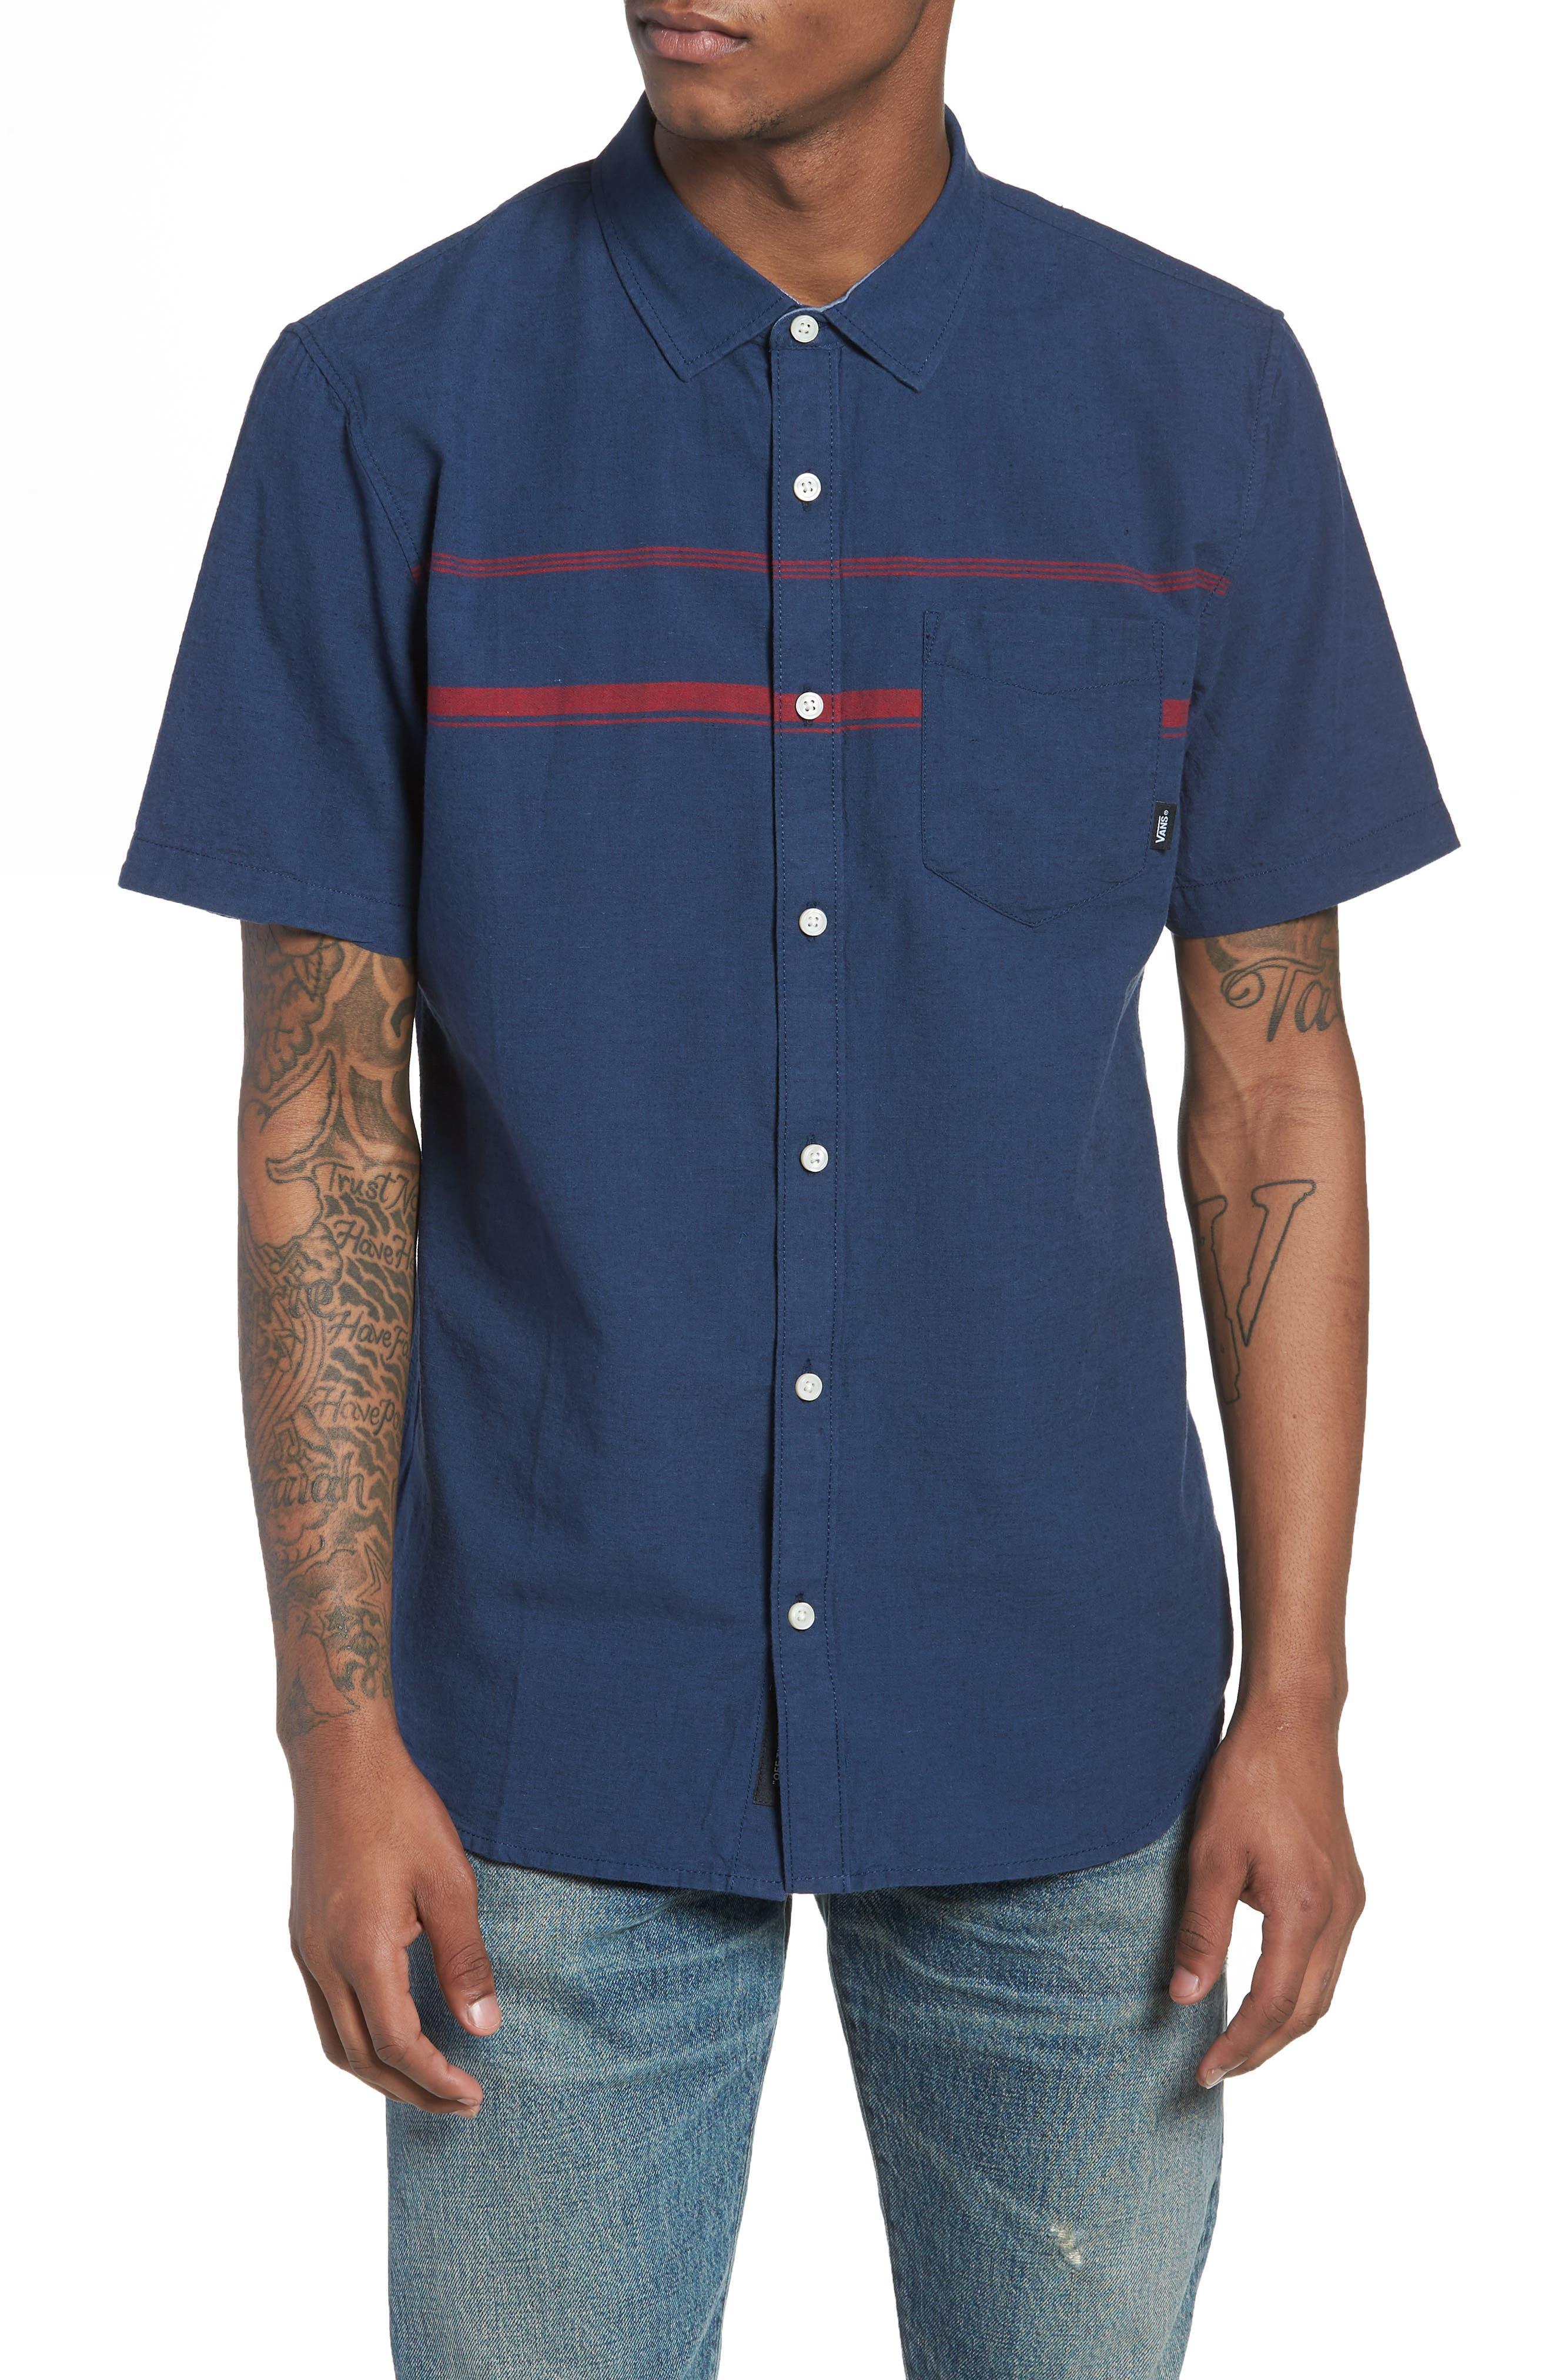 Thurber Short Sleeve Shirt,                         Main,                         color, Dress Blues